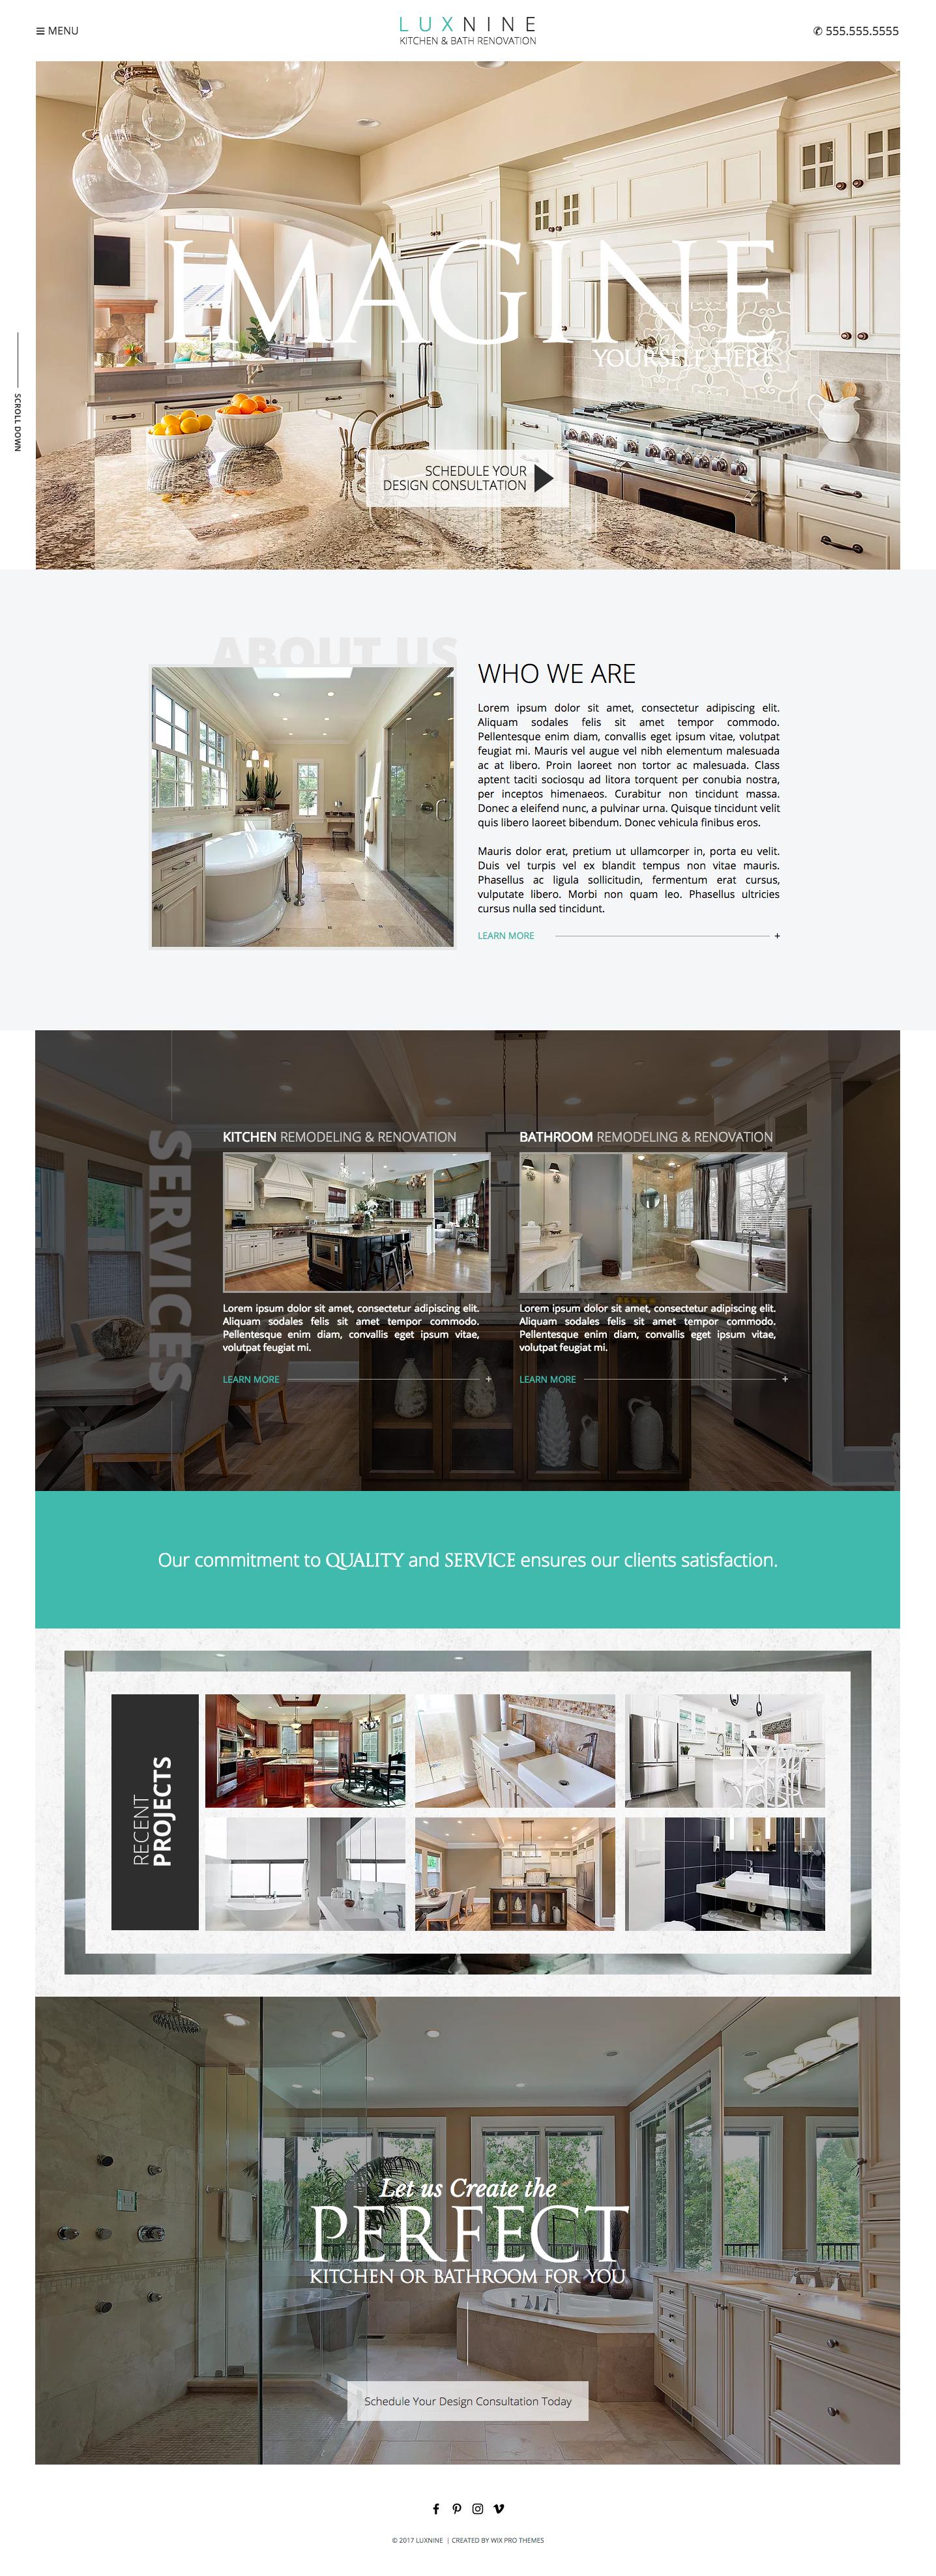 Kitchen & Bathroom Renovation Website Theme Template | Website ...